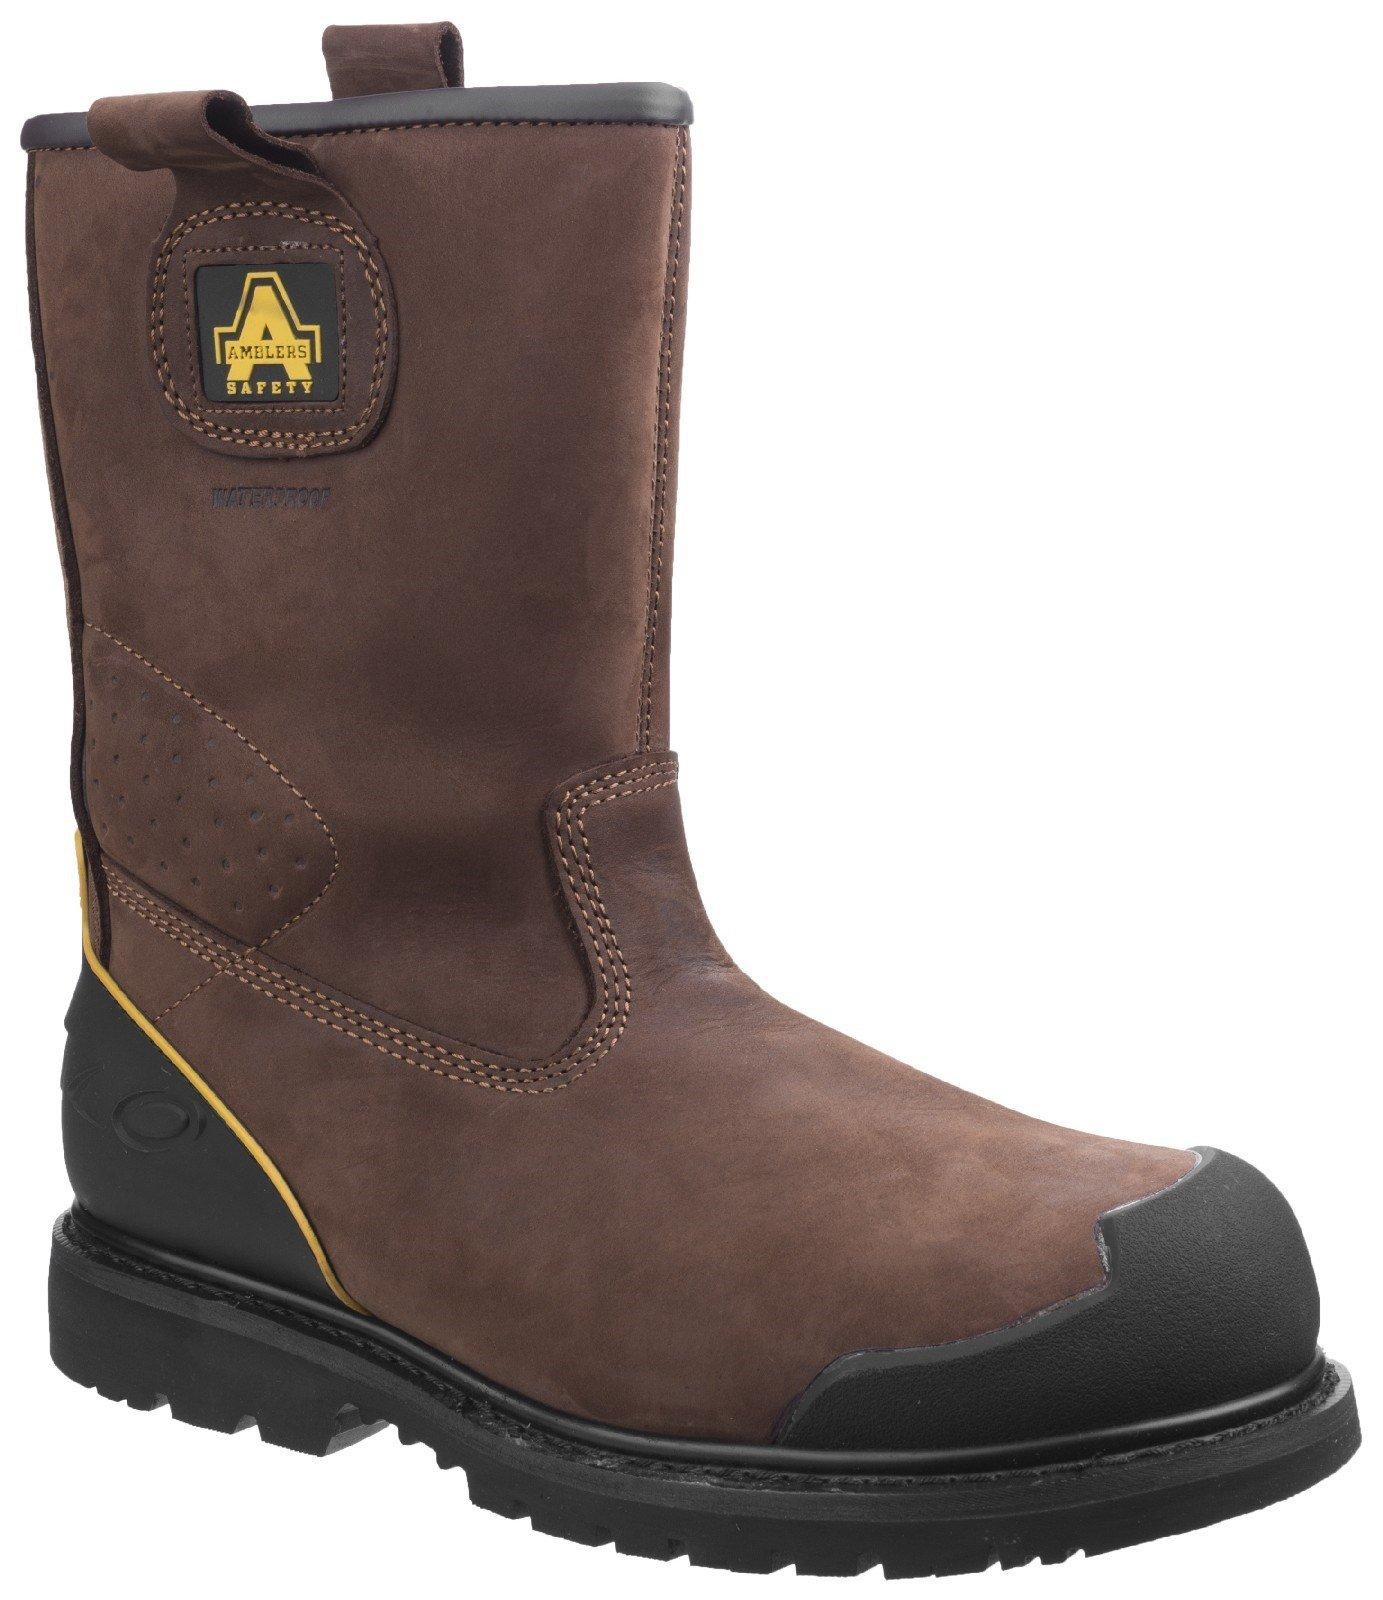 Amblers Unisex Safety Goodyear Waterproof Pull on Industrial Boot Brown 20431 - Brown 6